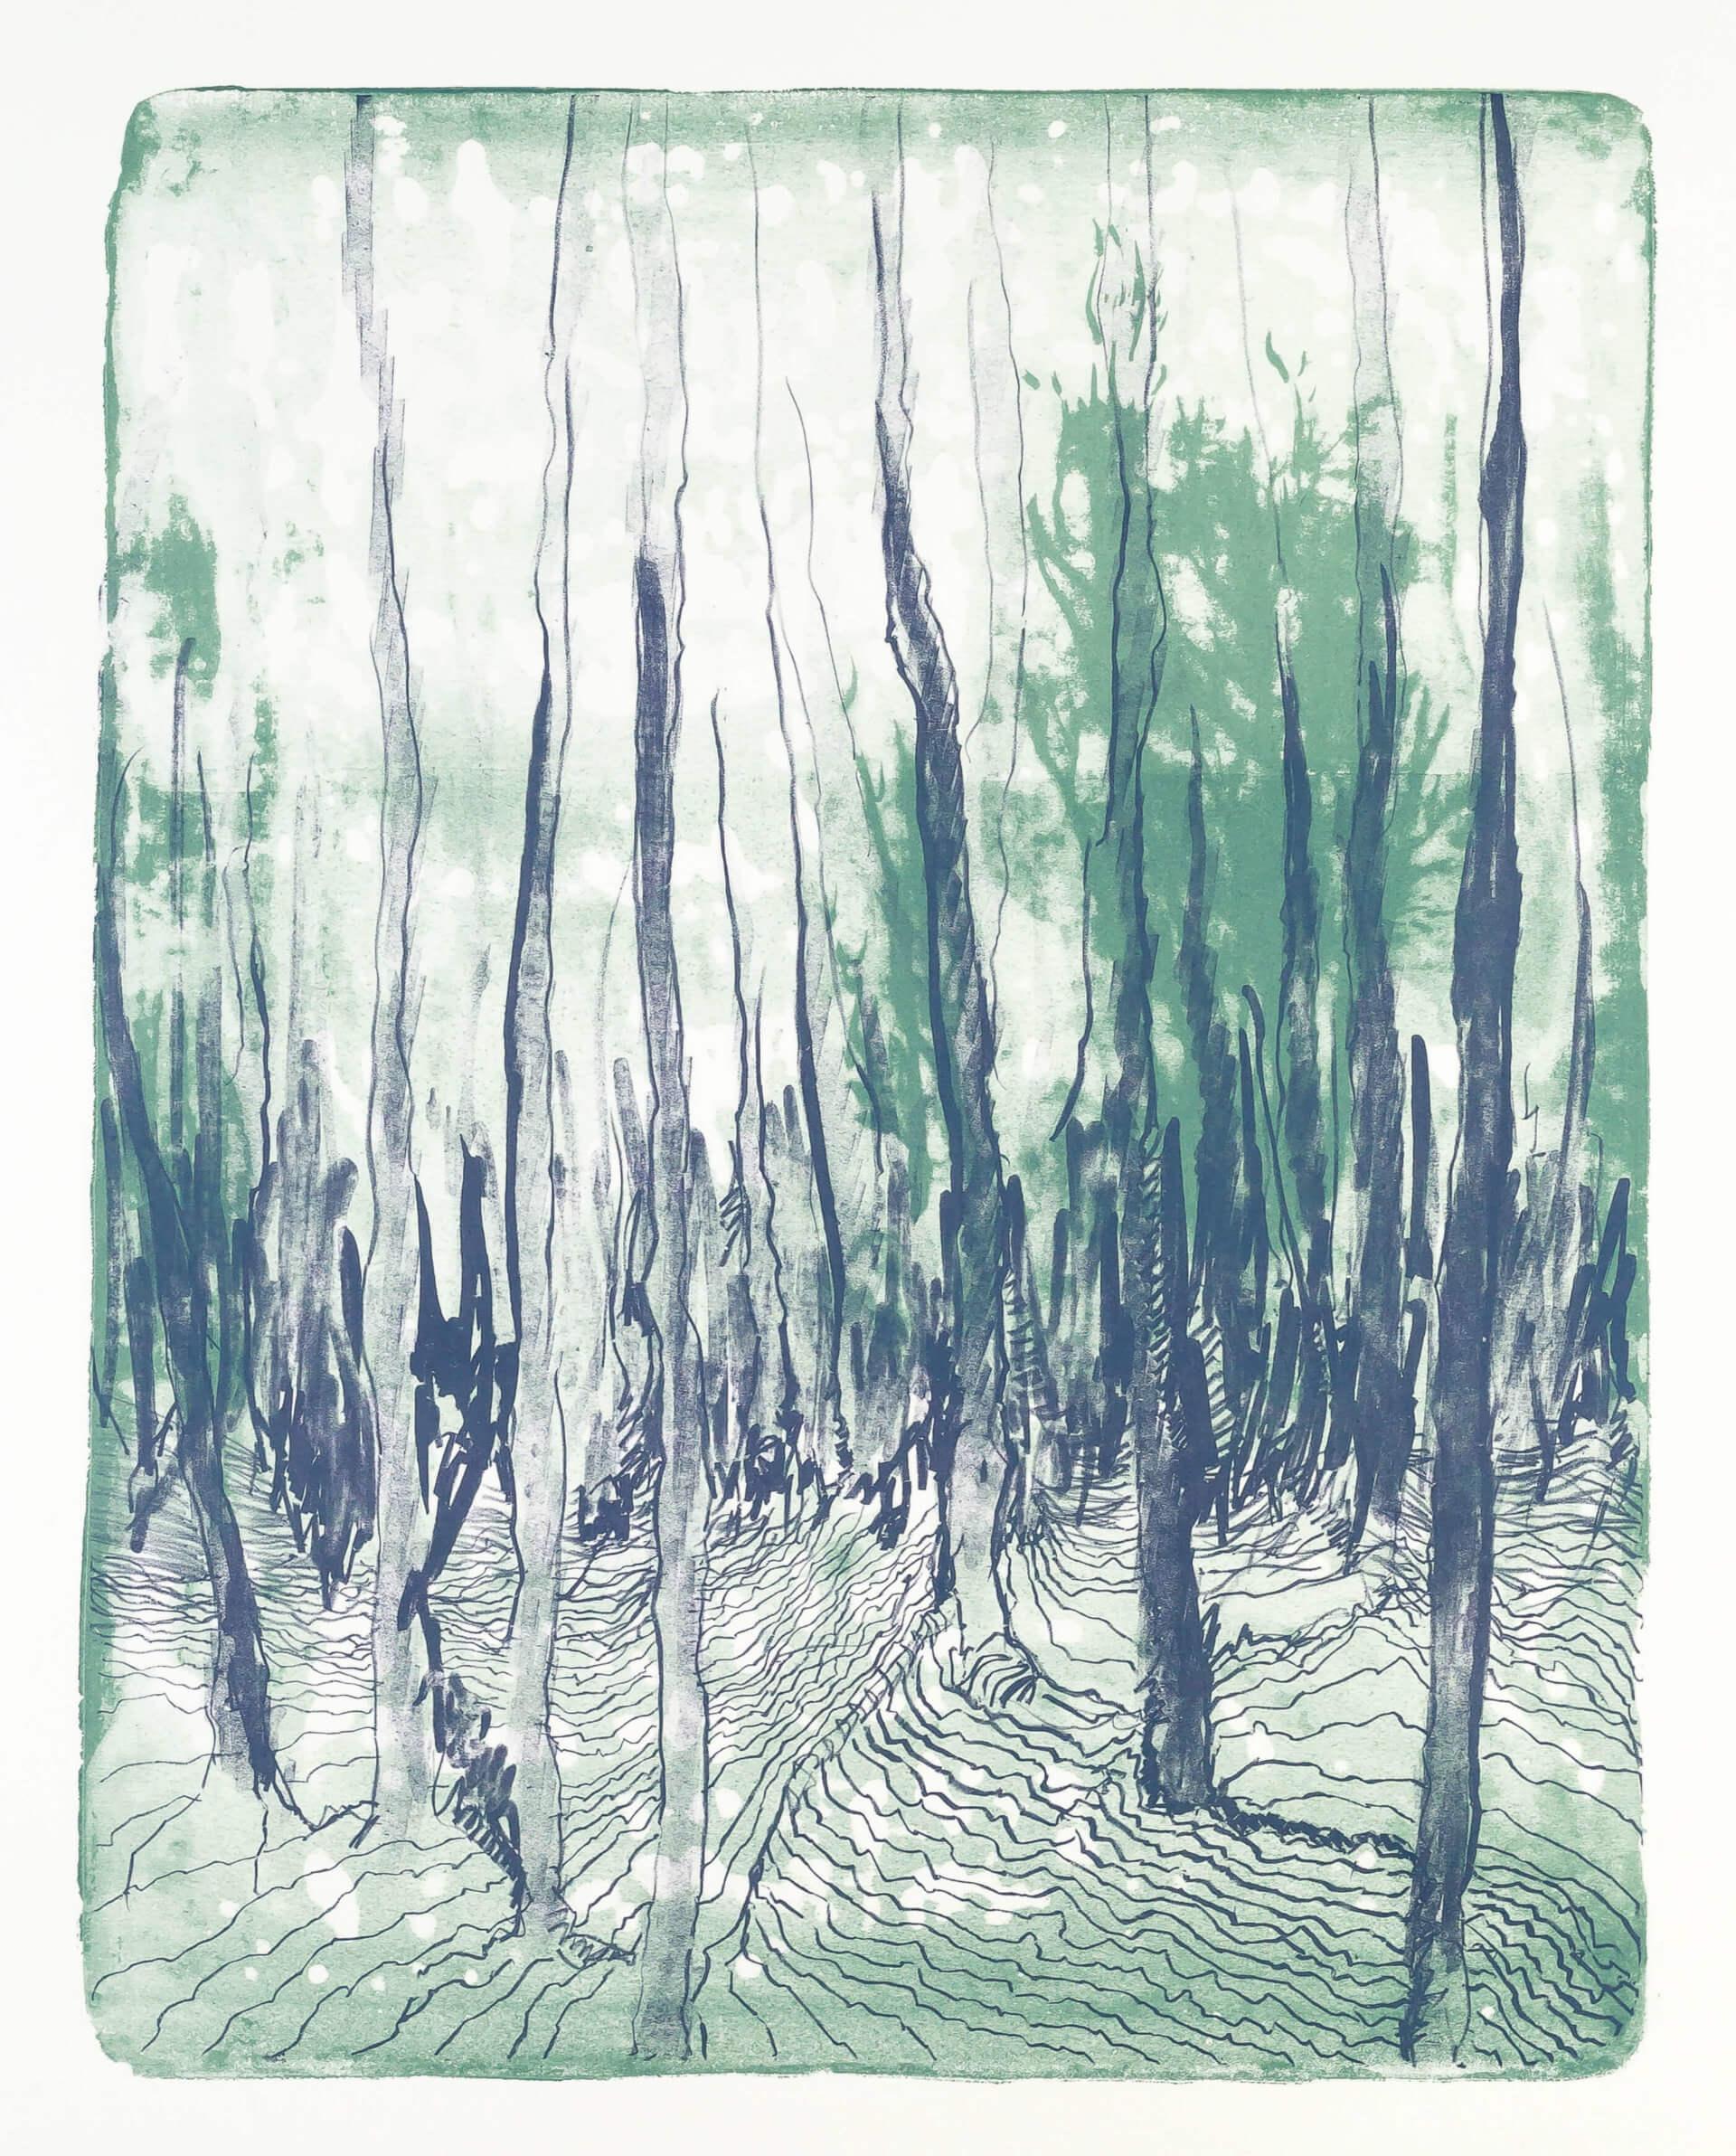 Katharina Albers, Wald X-IV, 2015, Farblithographie, Unikat, 50×40 cm